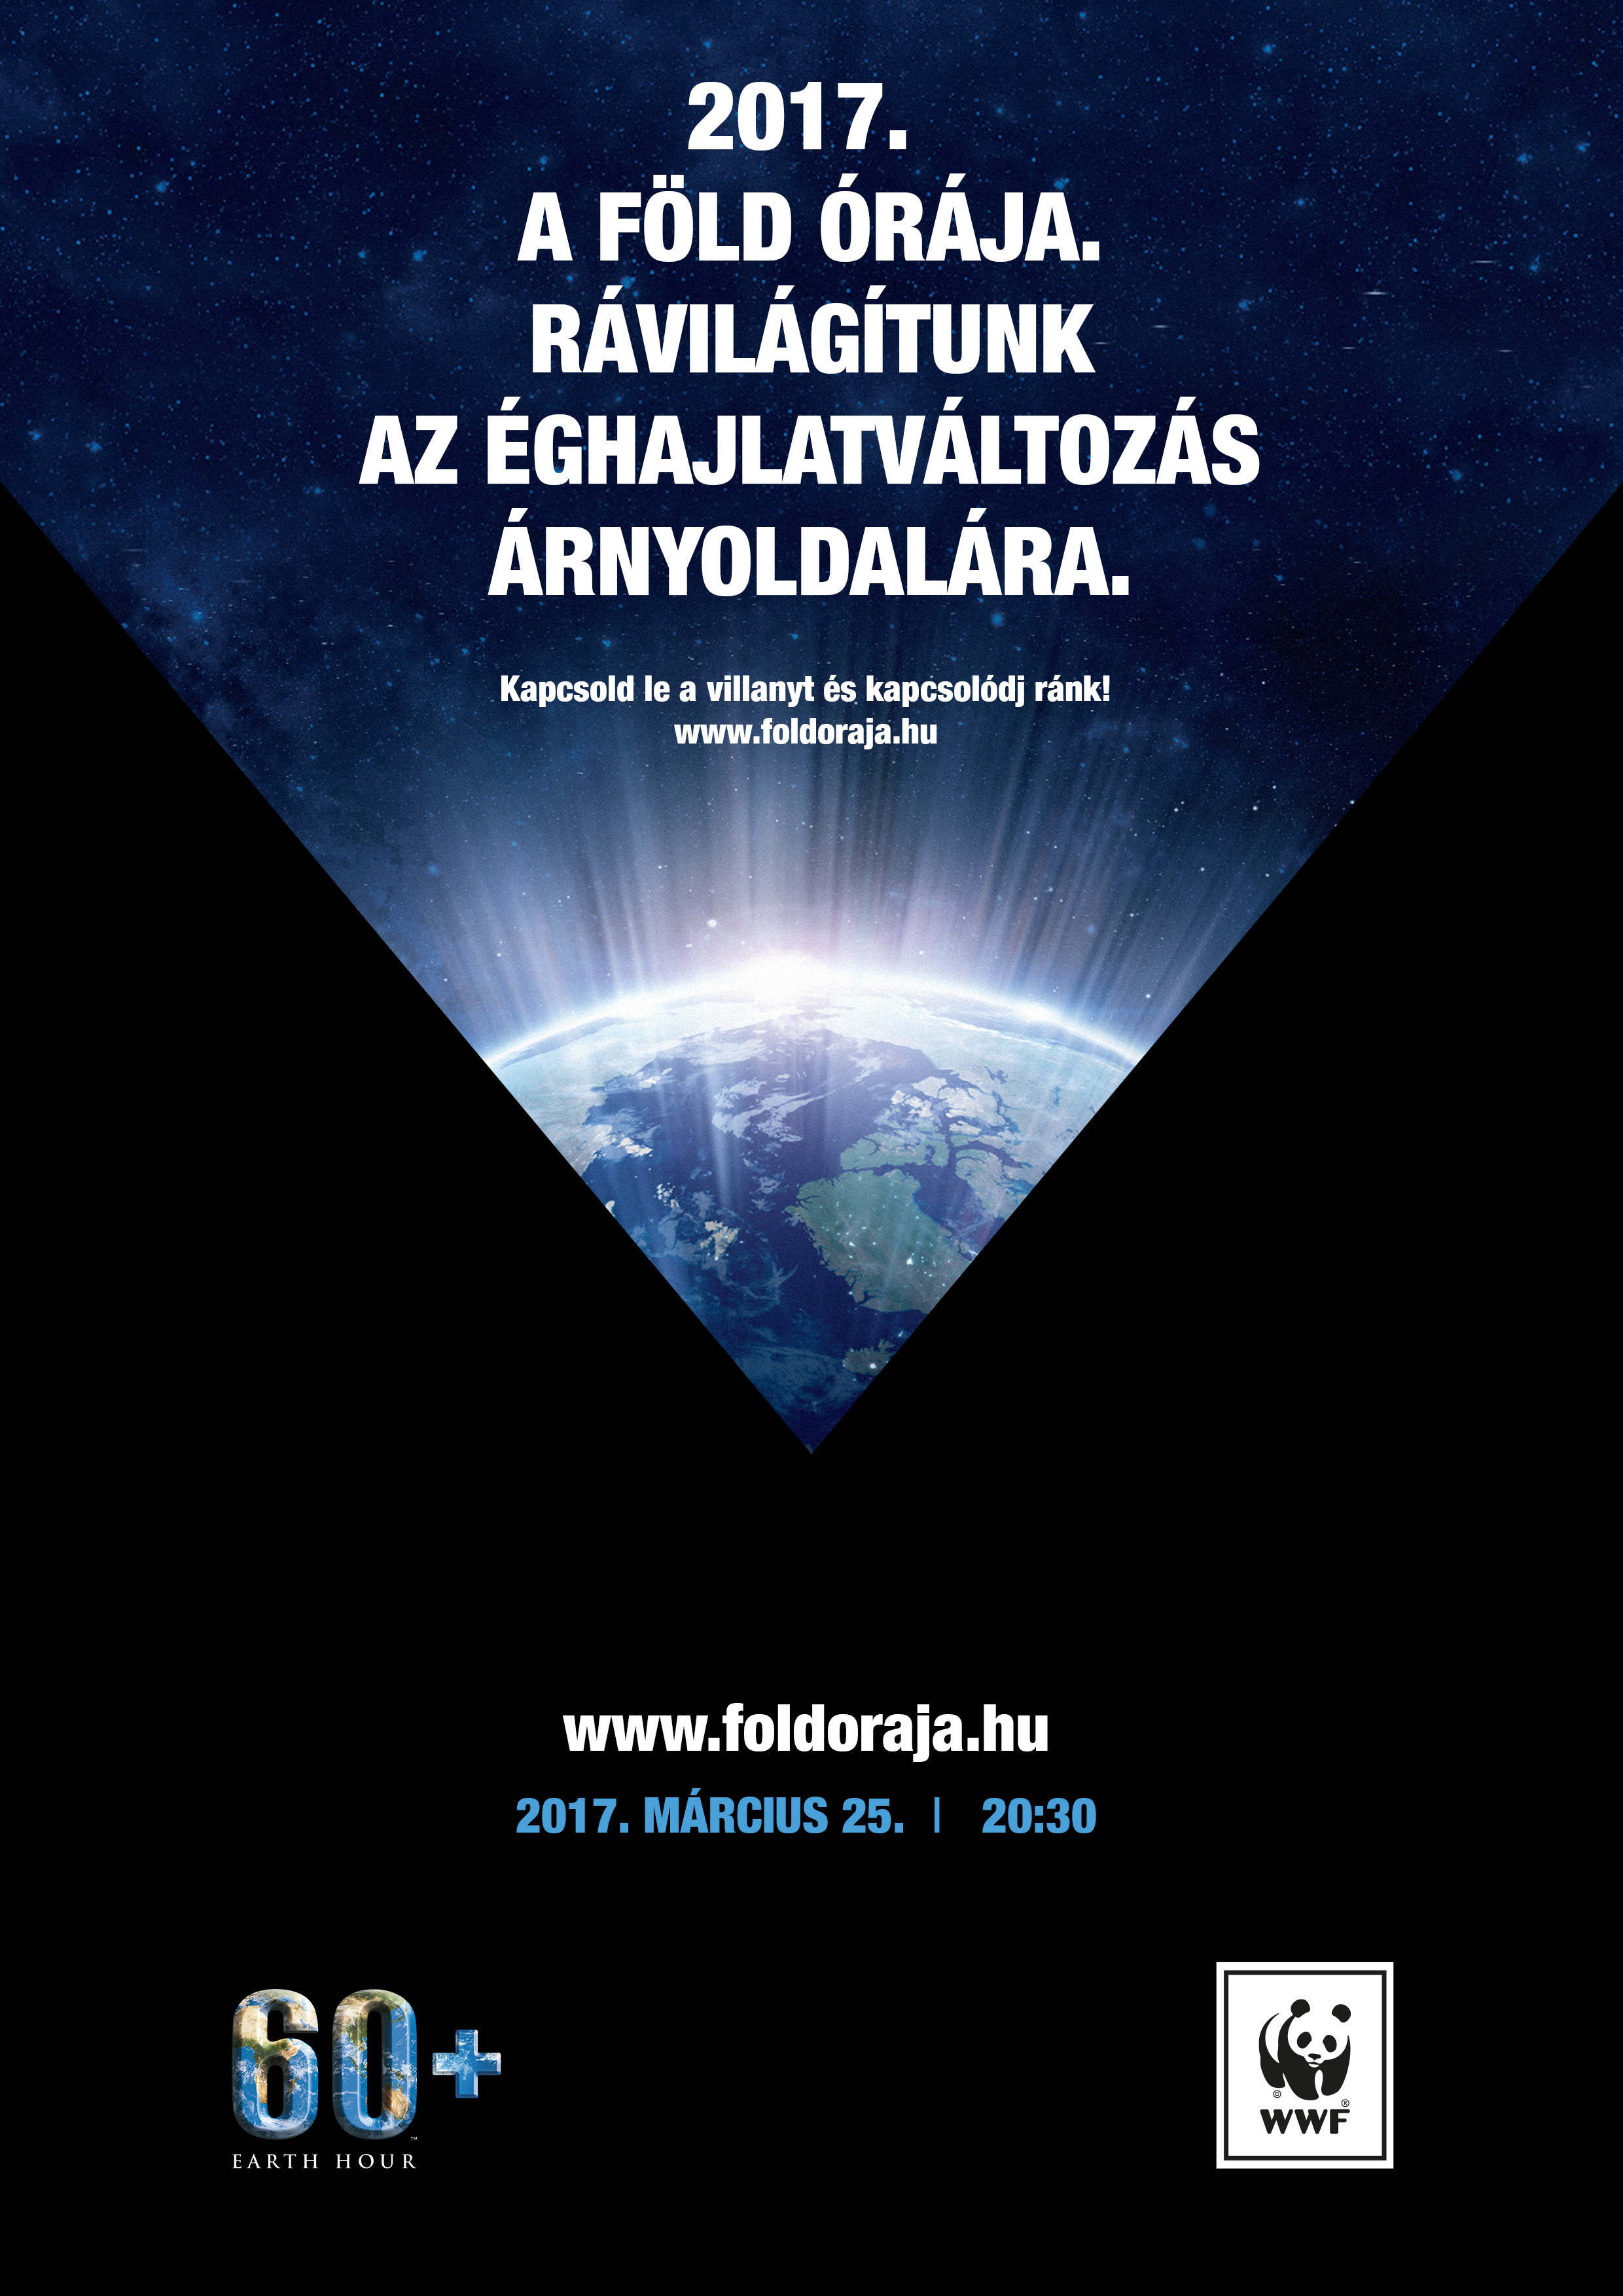 Föld órája 2017